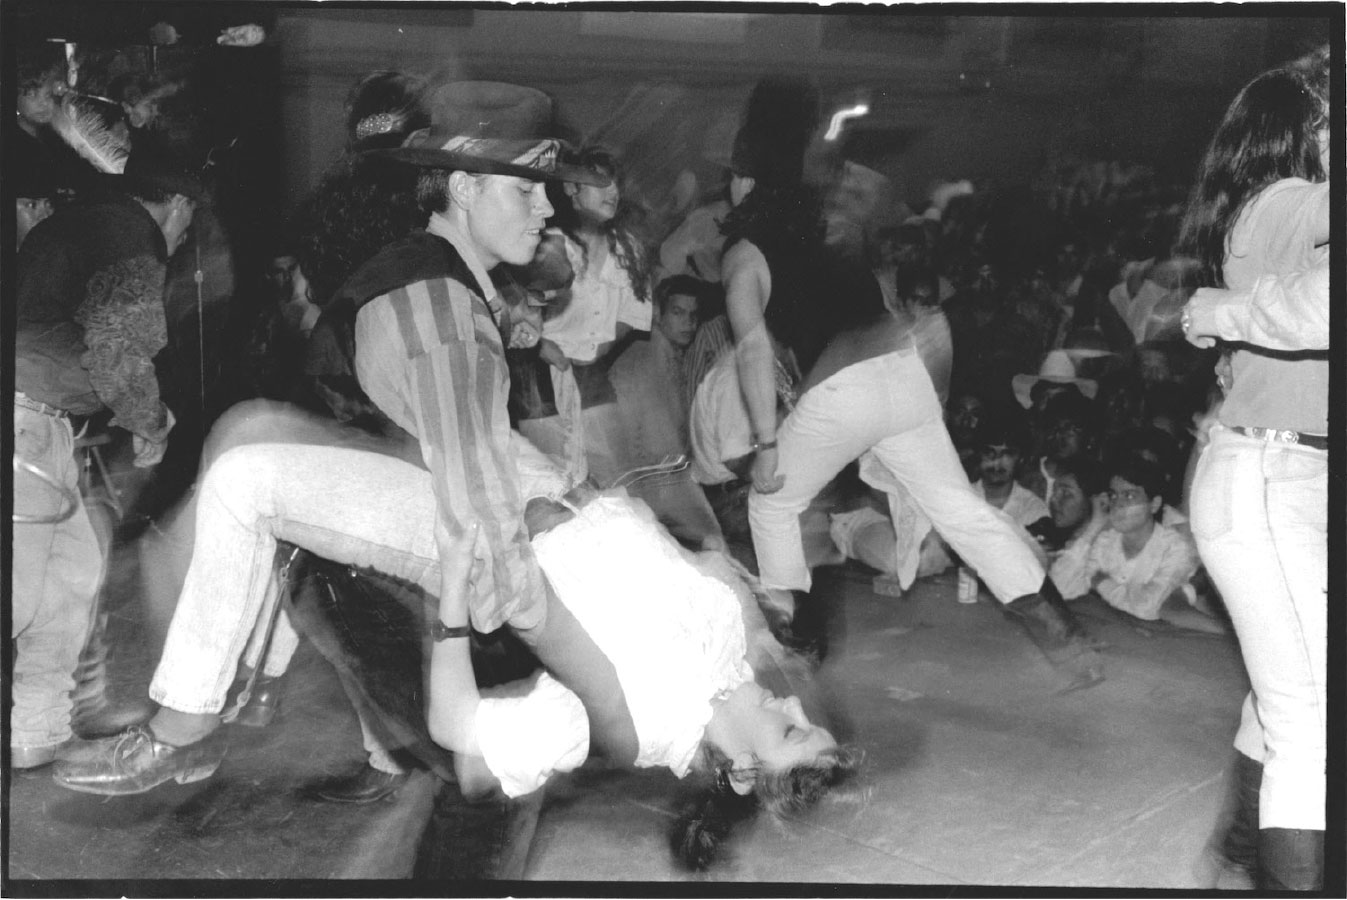 Dancing La Quebradita at the International Ballroom Doraville